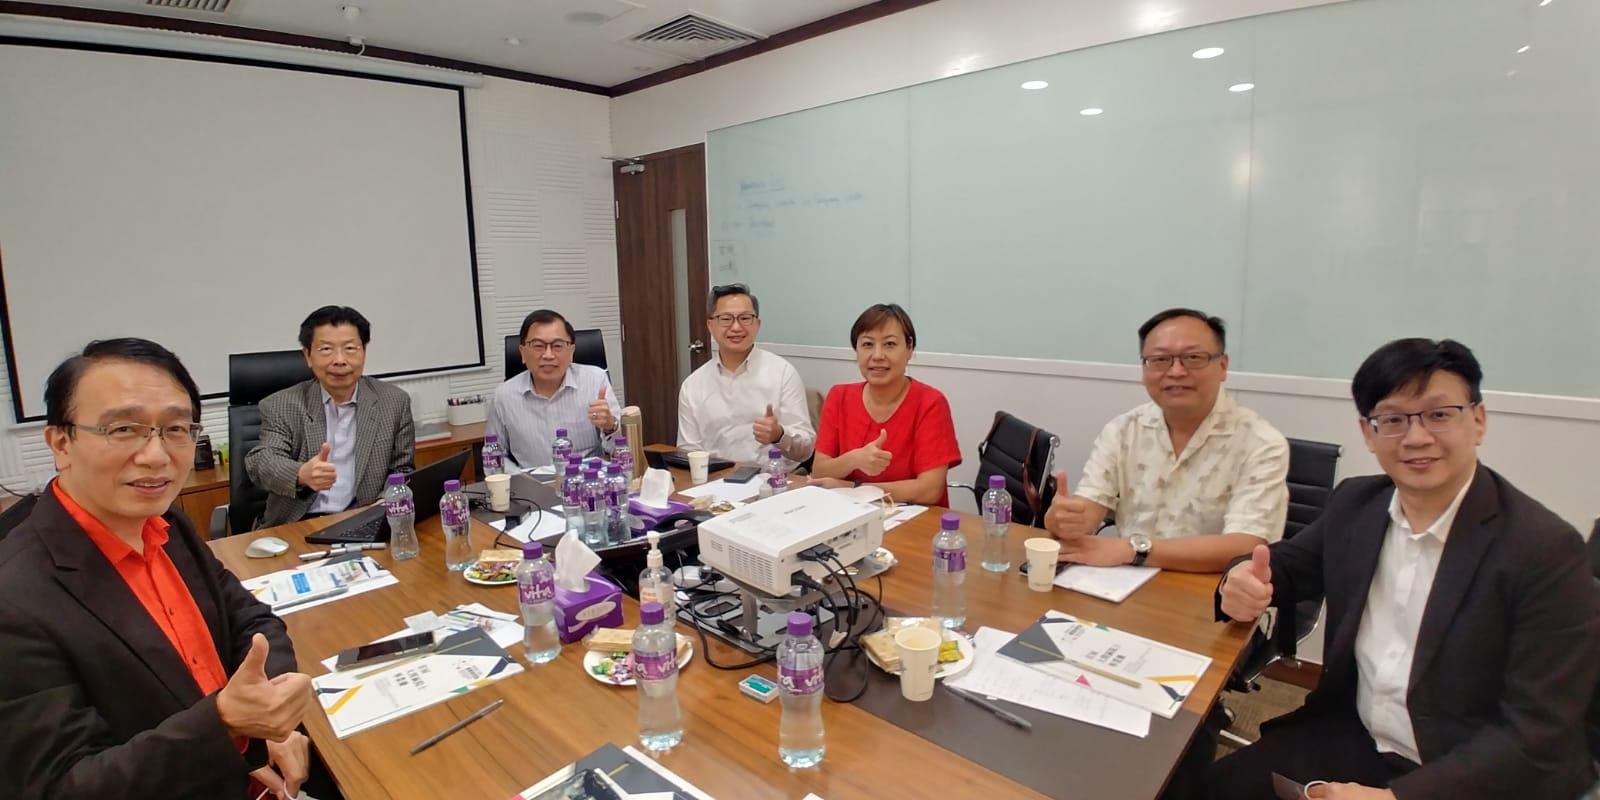 Completion of GLC Company Doctor Program (Jun 2021 Class)